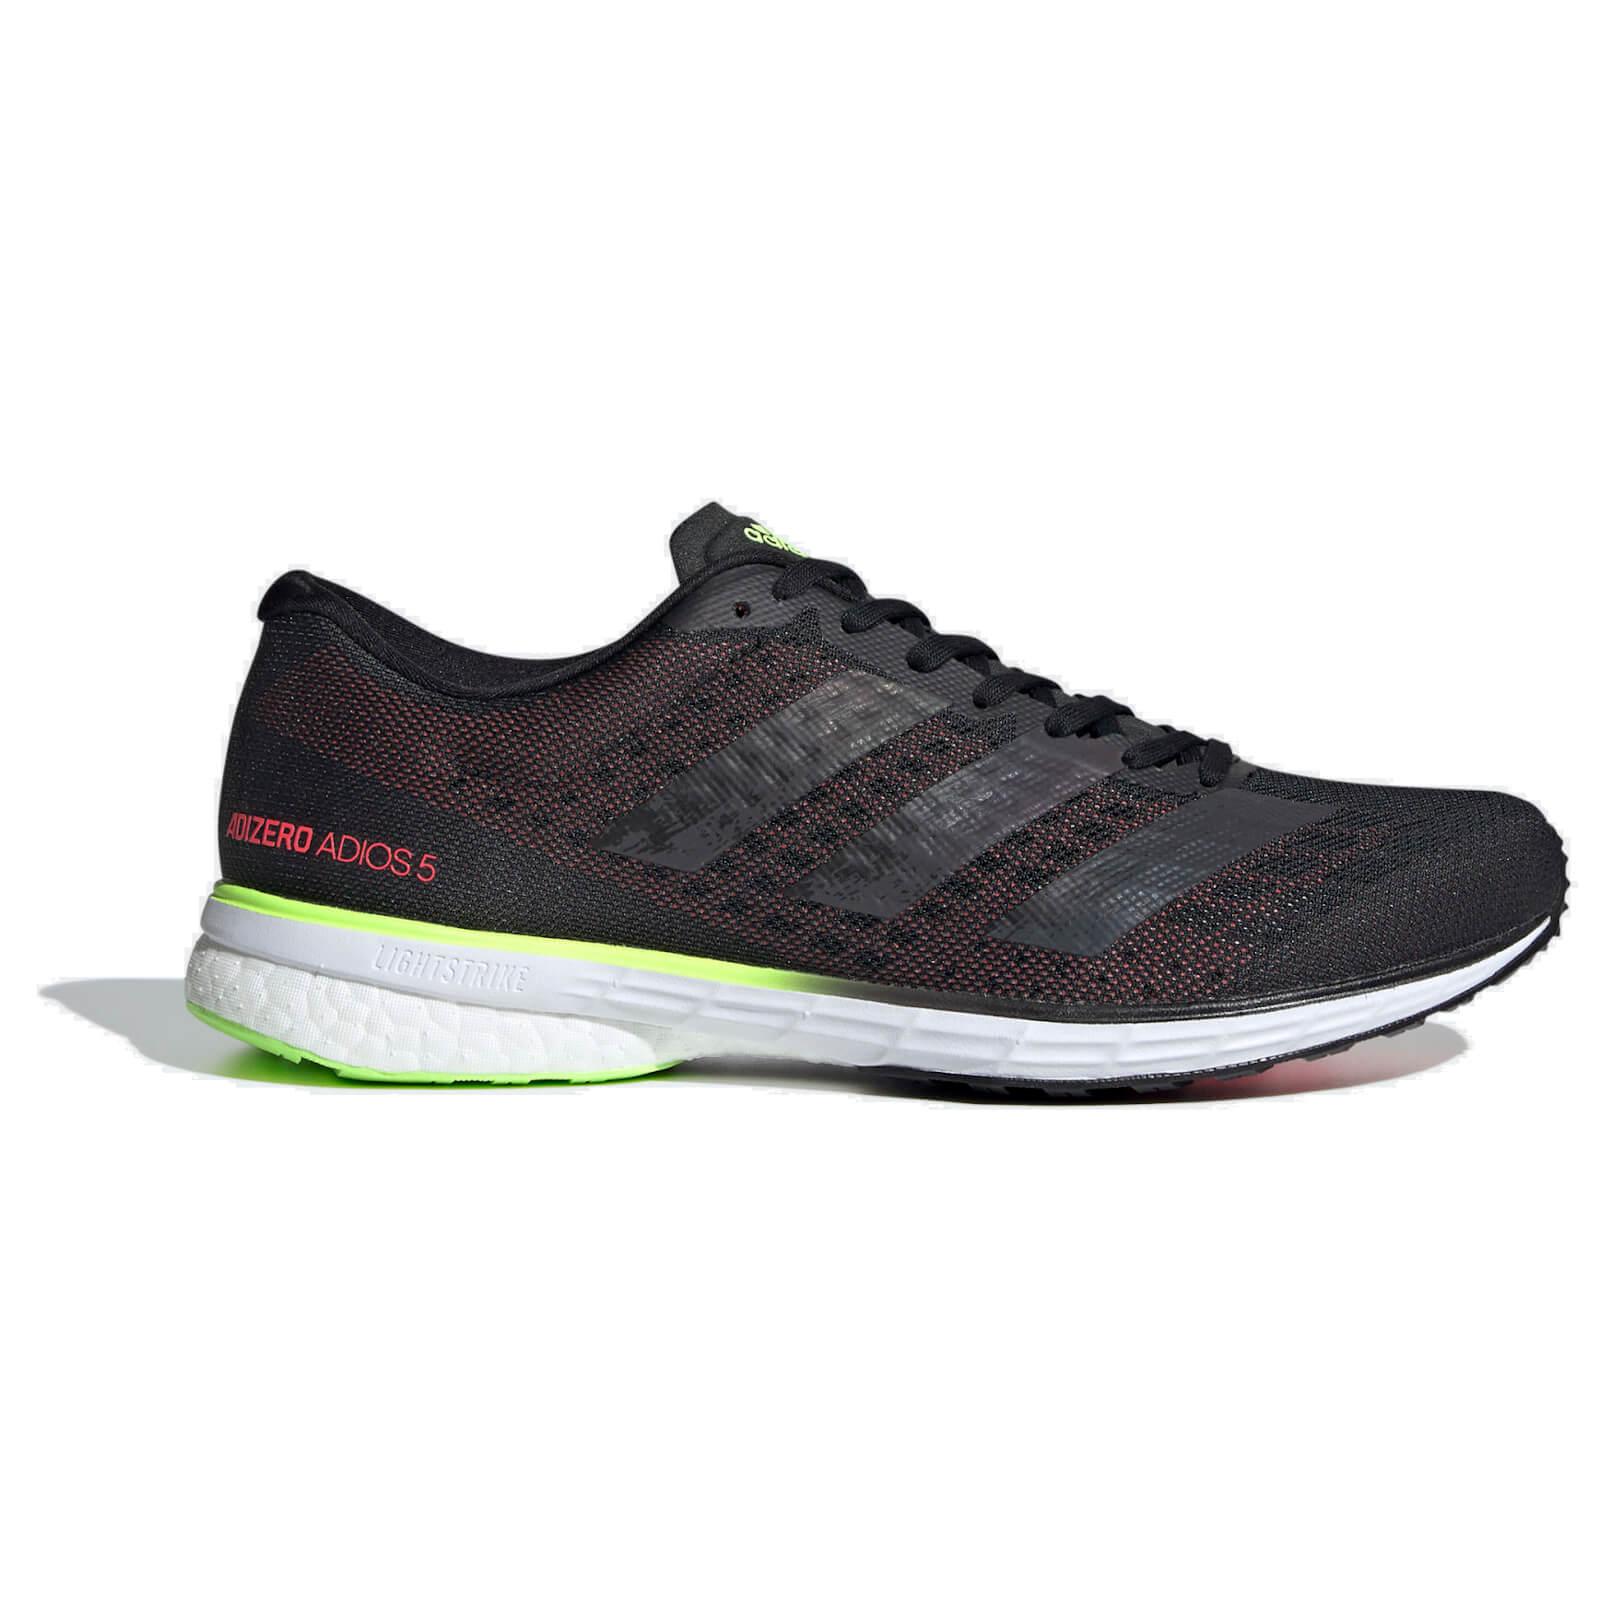 adidas Adizero Adios 5 Running Shoes - Black - US 11.5/UK 11